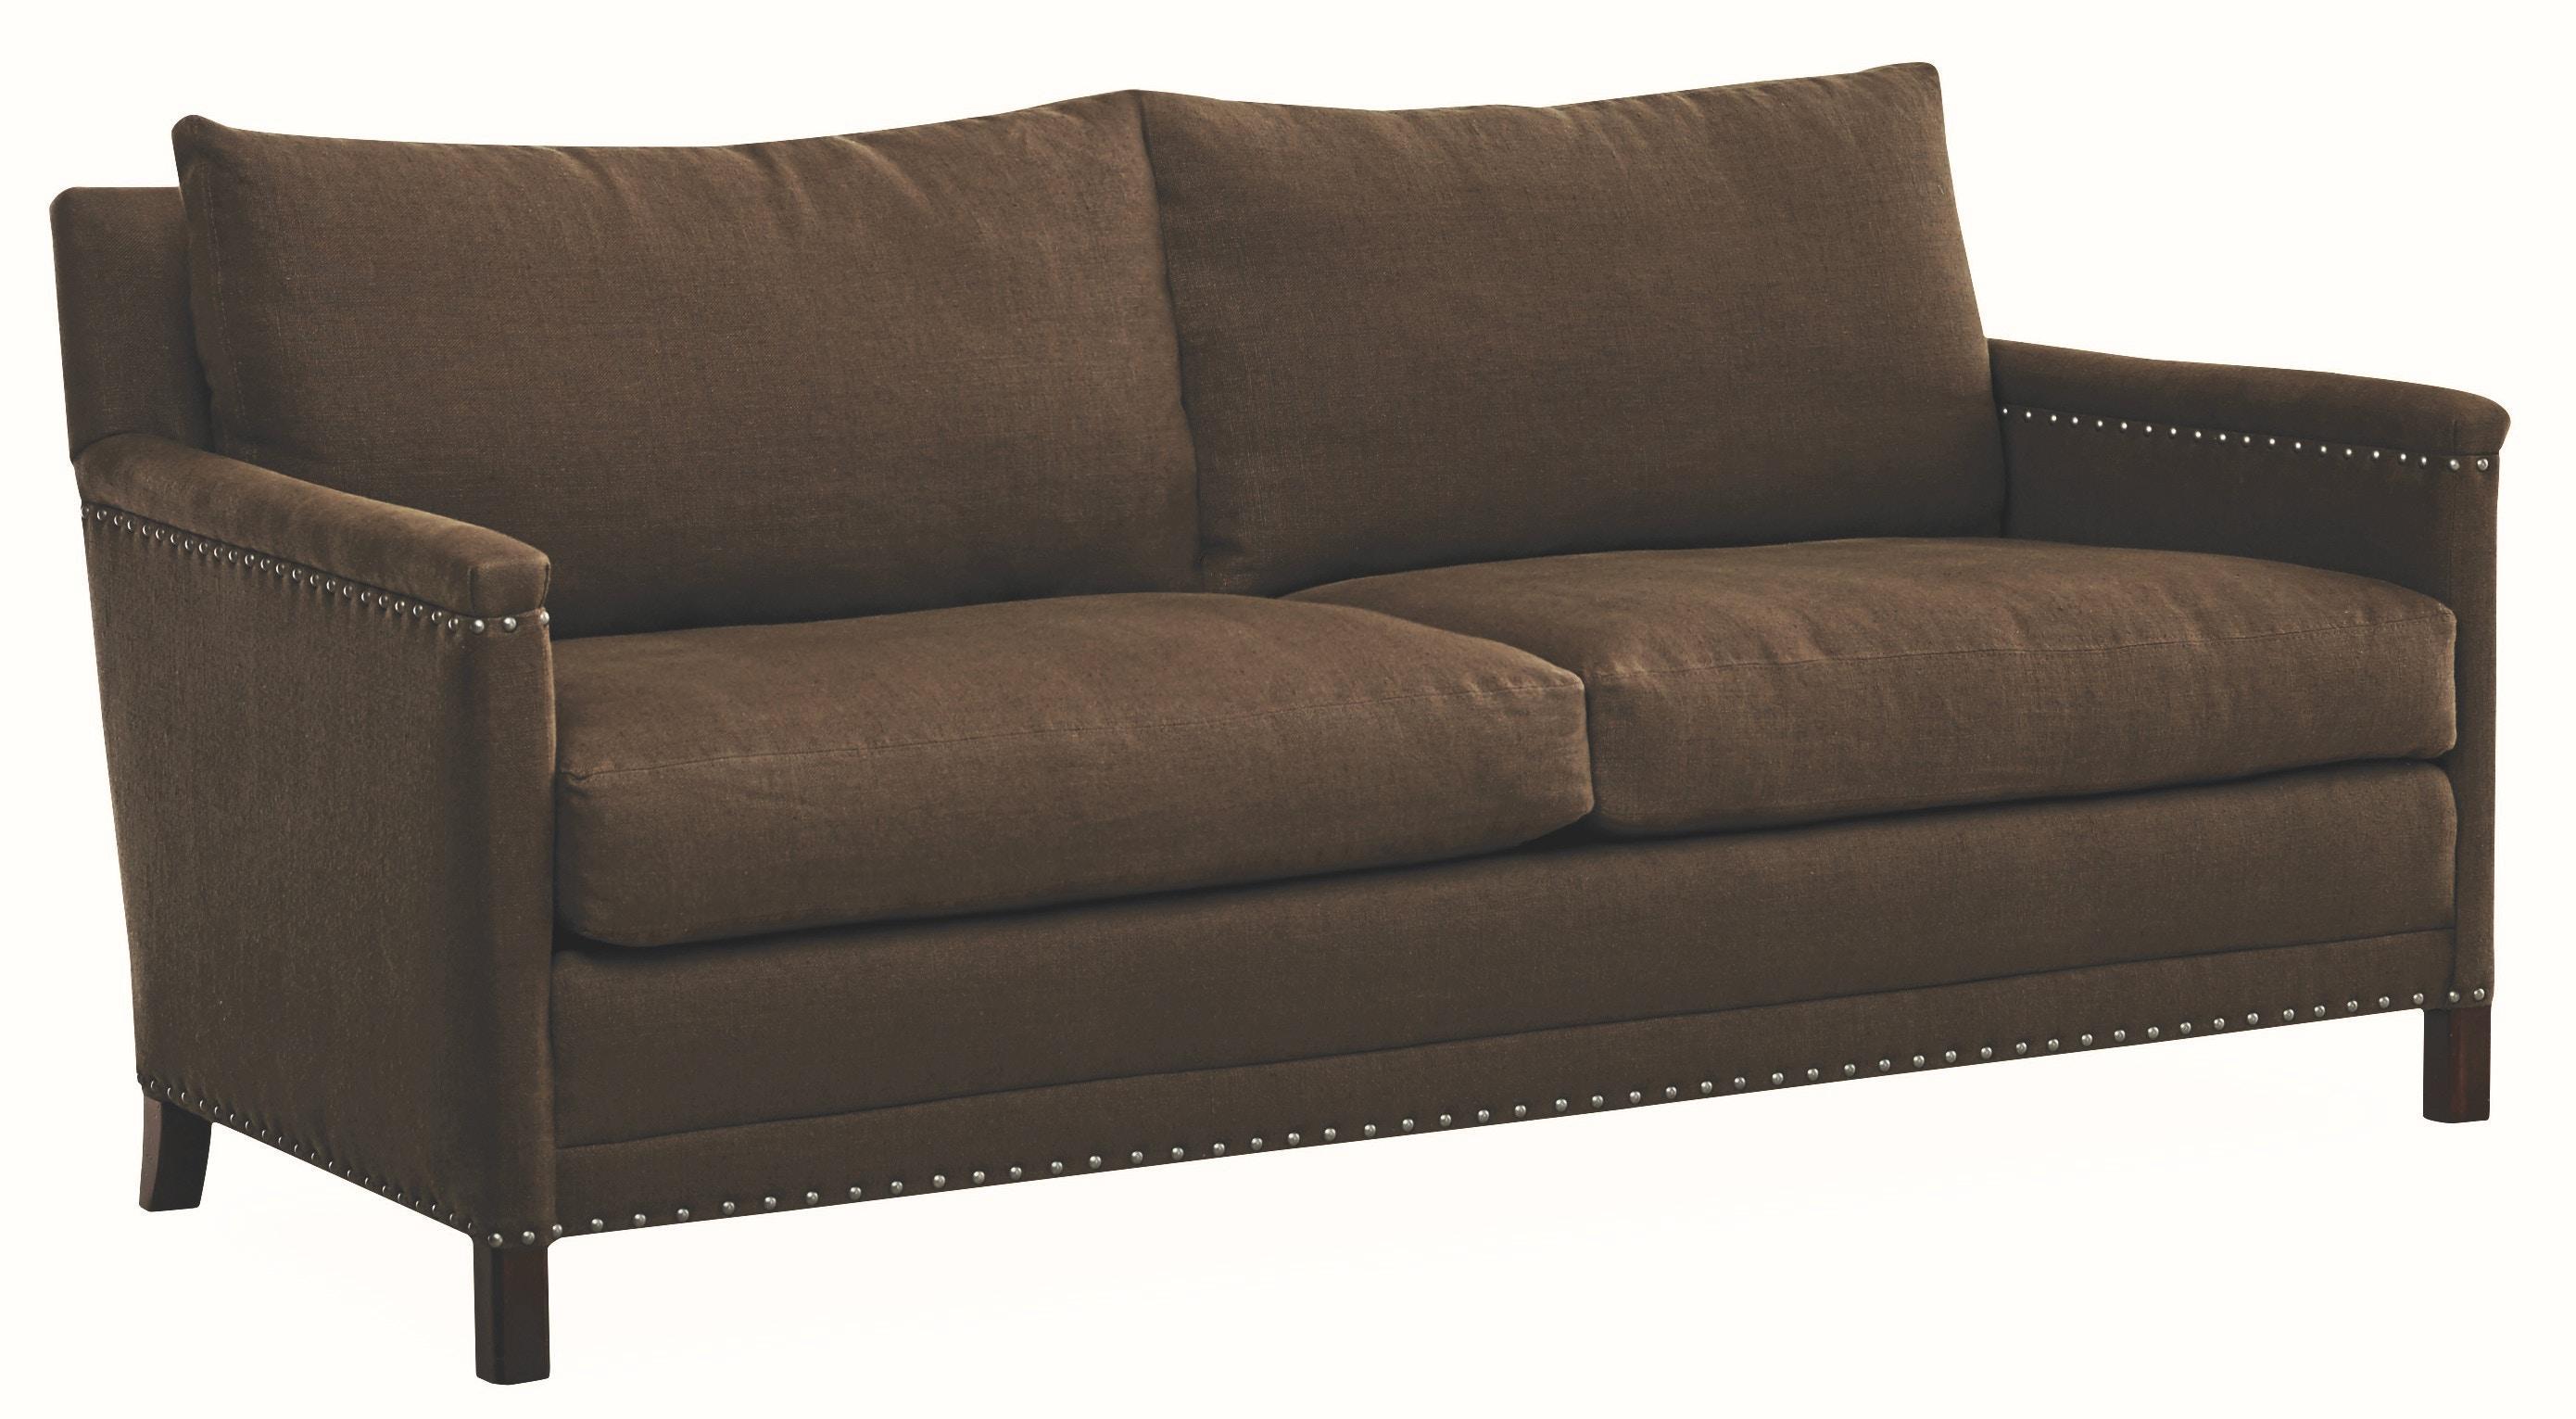 lee industries sofa prices fatboy lamzac instant air living room apartment 1935 11 toms